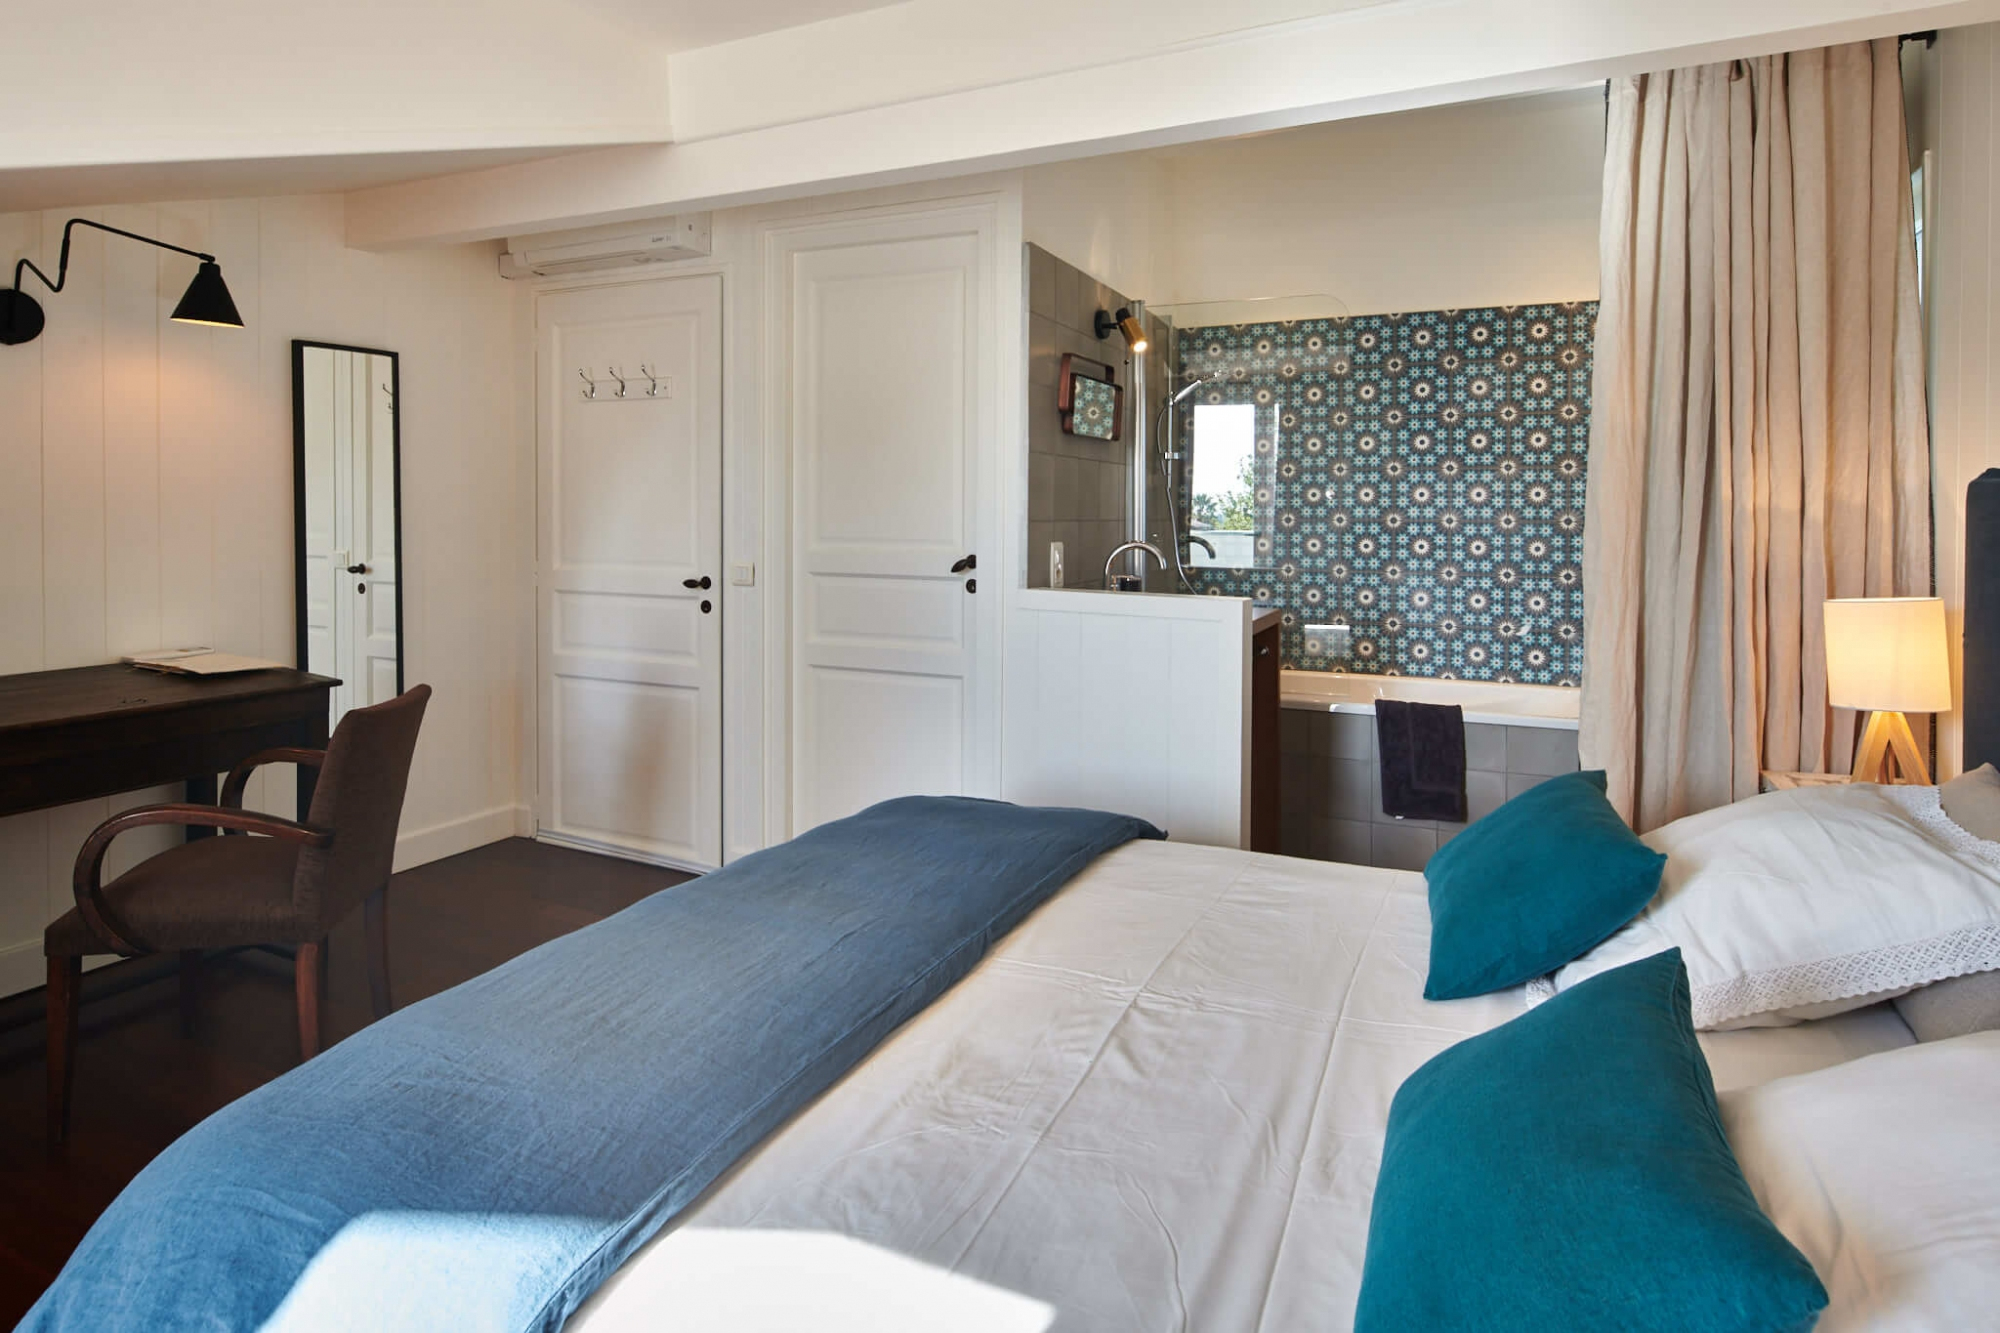 Chambre D'Hôte Ilbarritz En Location | Arbolateia Biarritz serapportantà Chambre D Hote Cahors